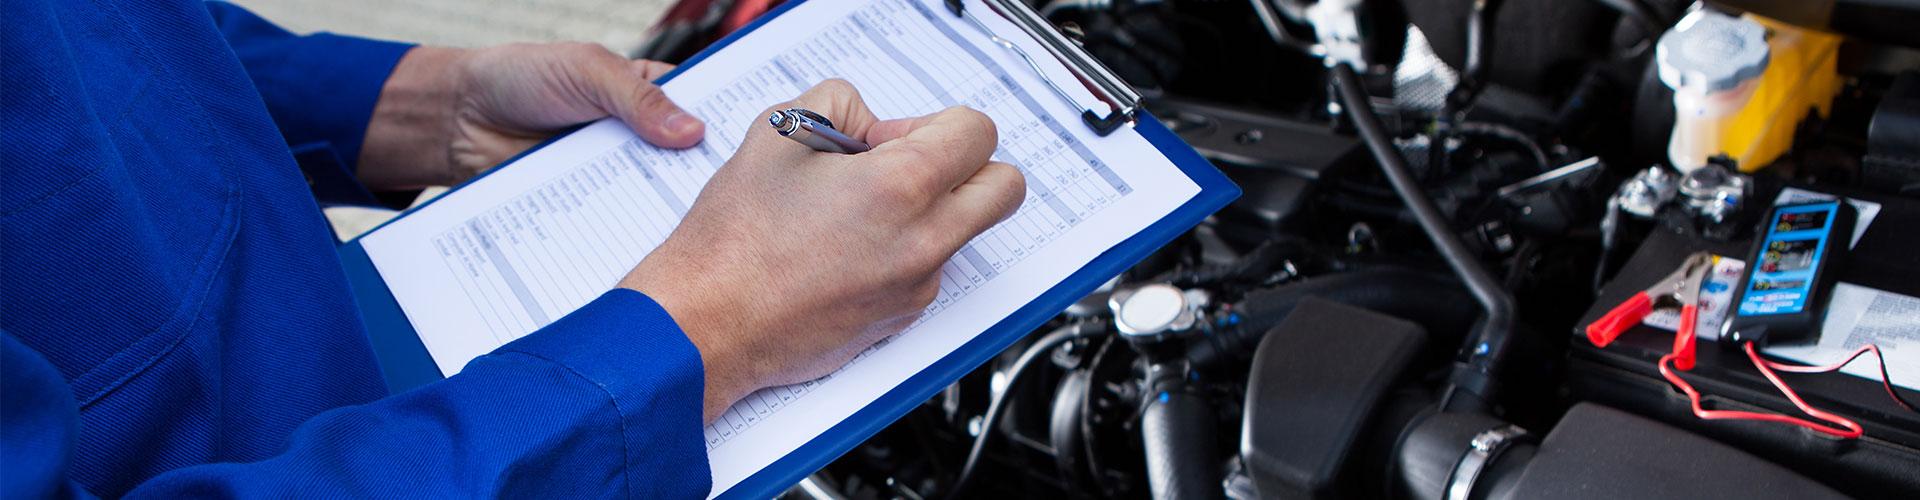 Engine service check list